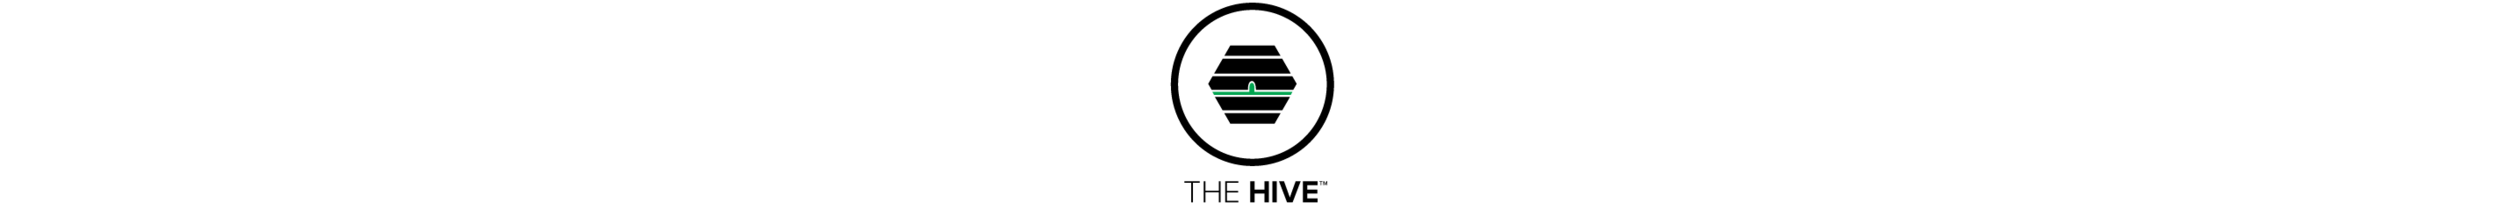 SLP_Hive_Signature_small-01.png